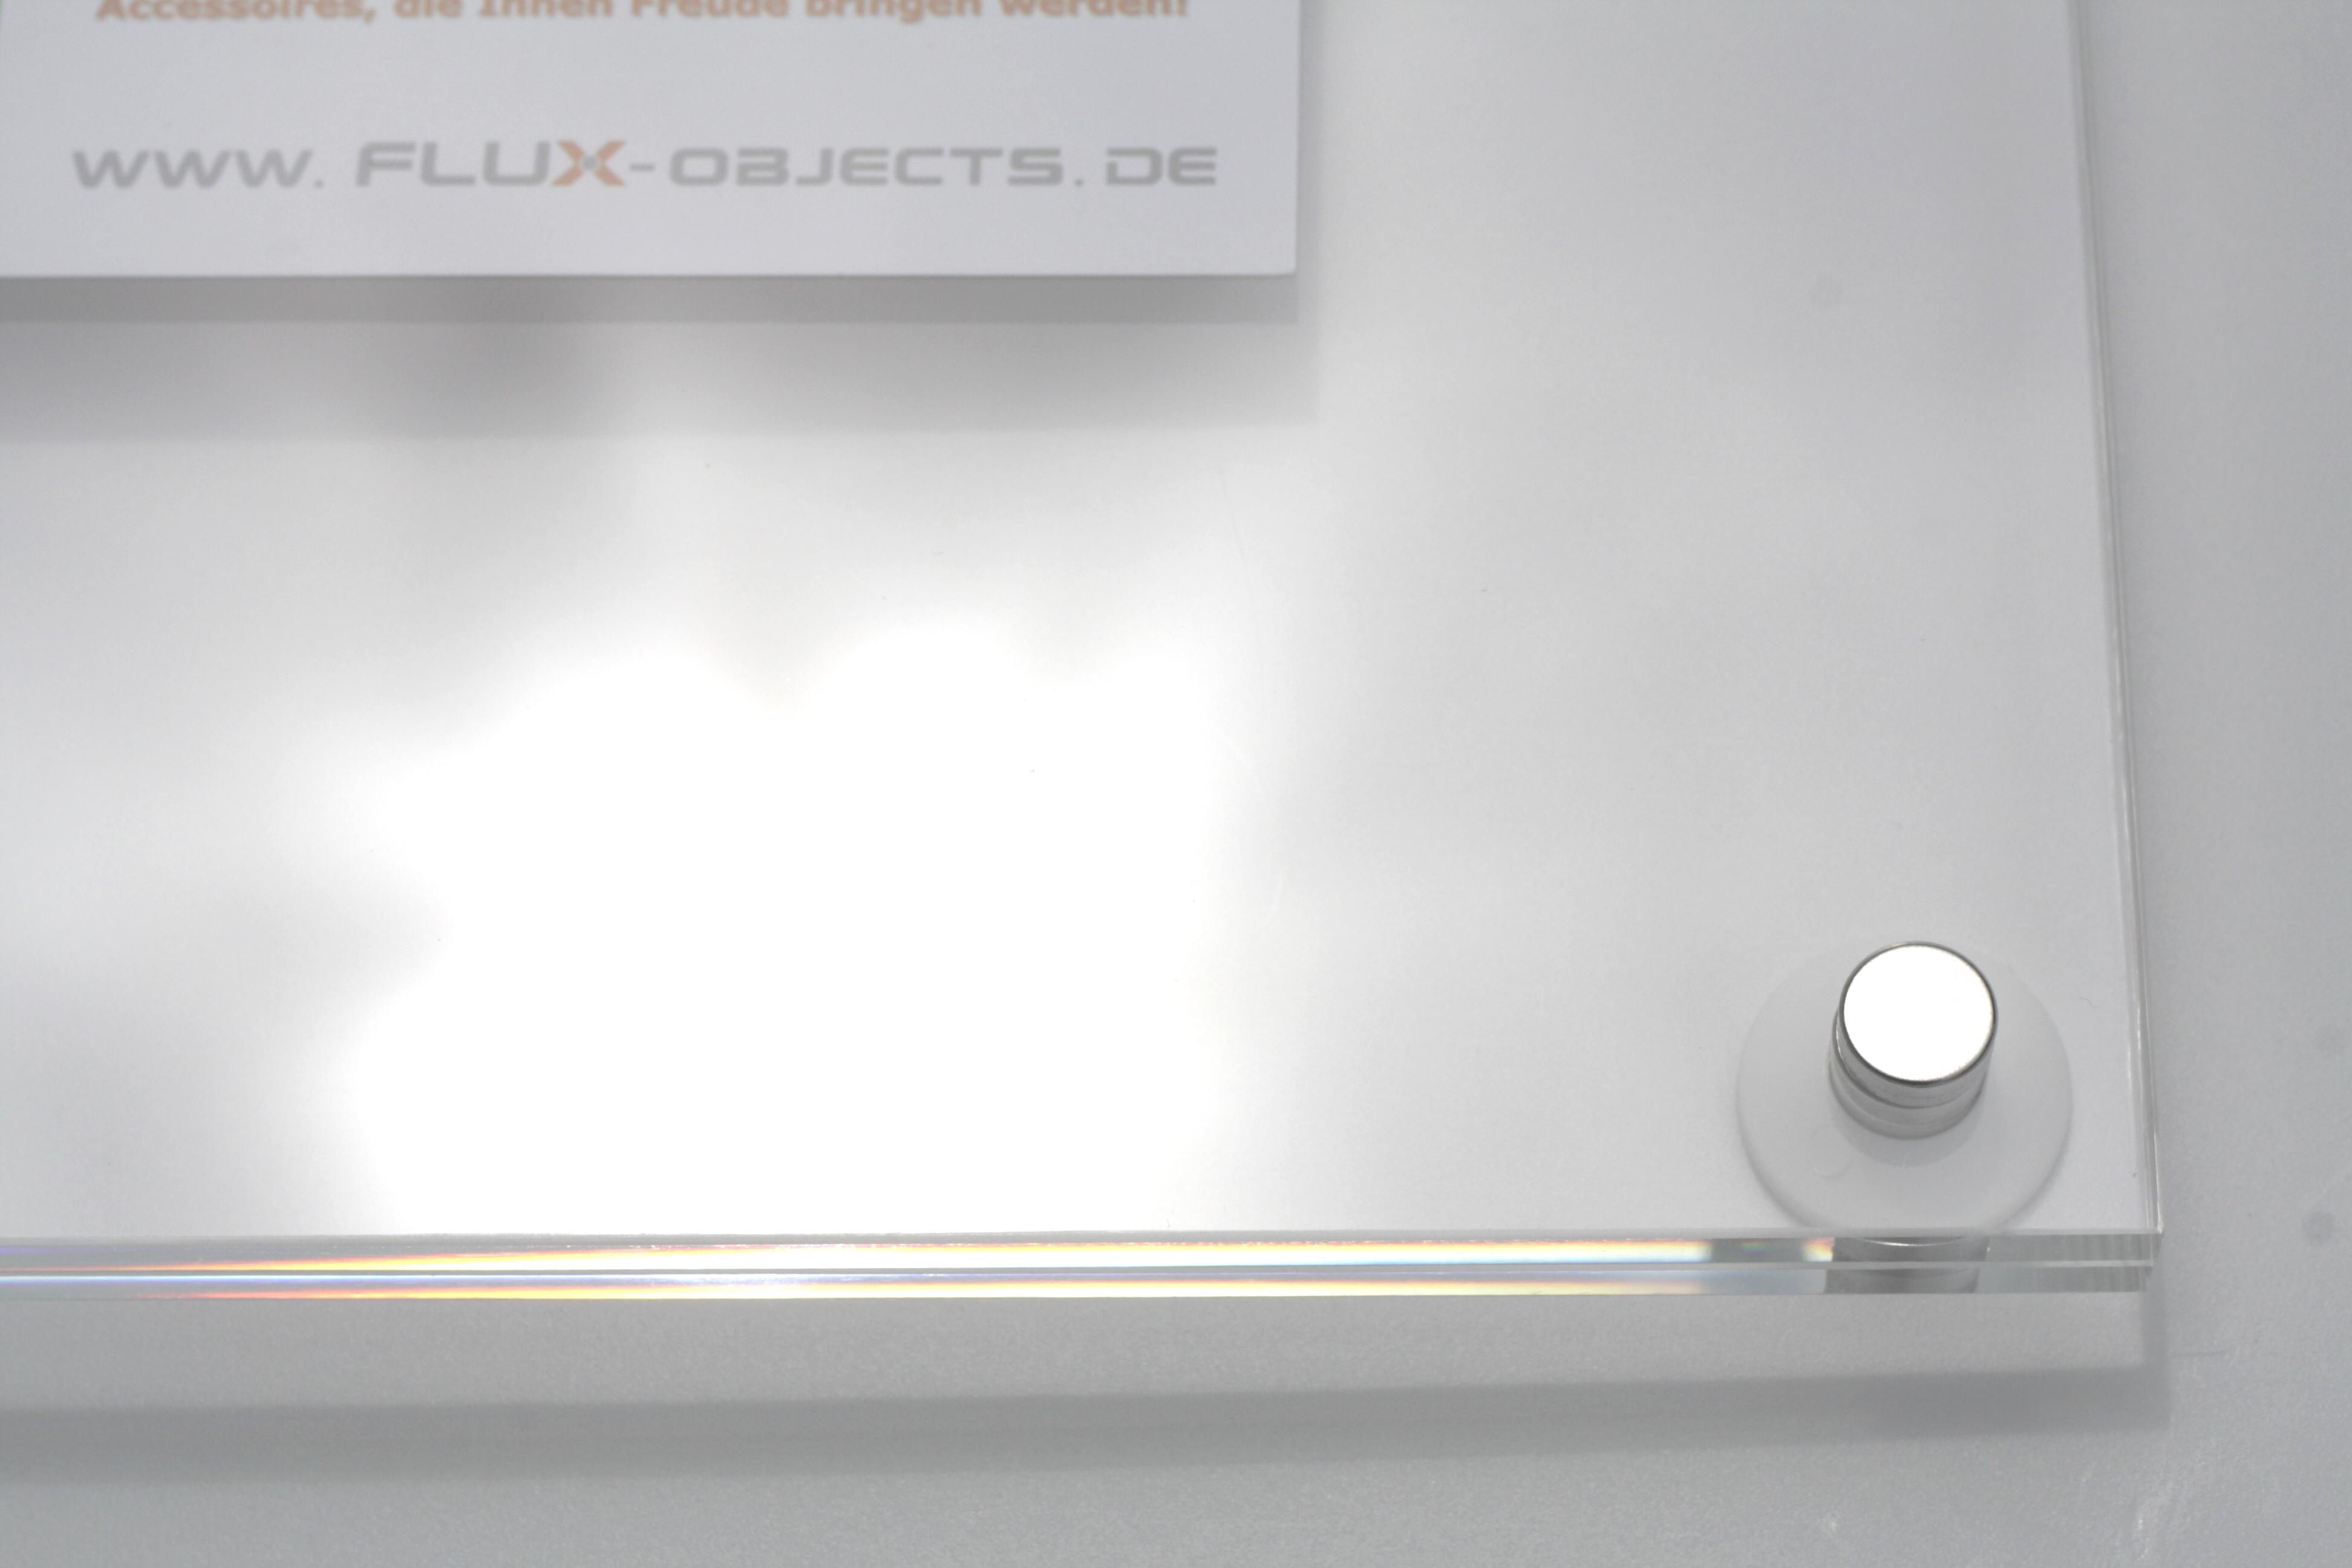 FLUX-Frame, Acrylglas-Wandrahmen (34 x 25 cm, für DIN A4)-306